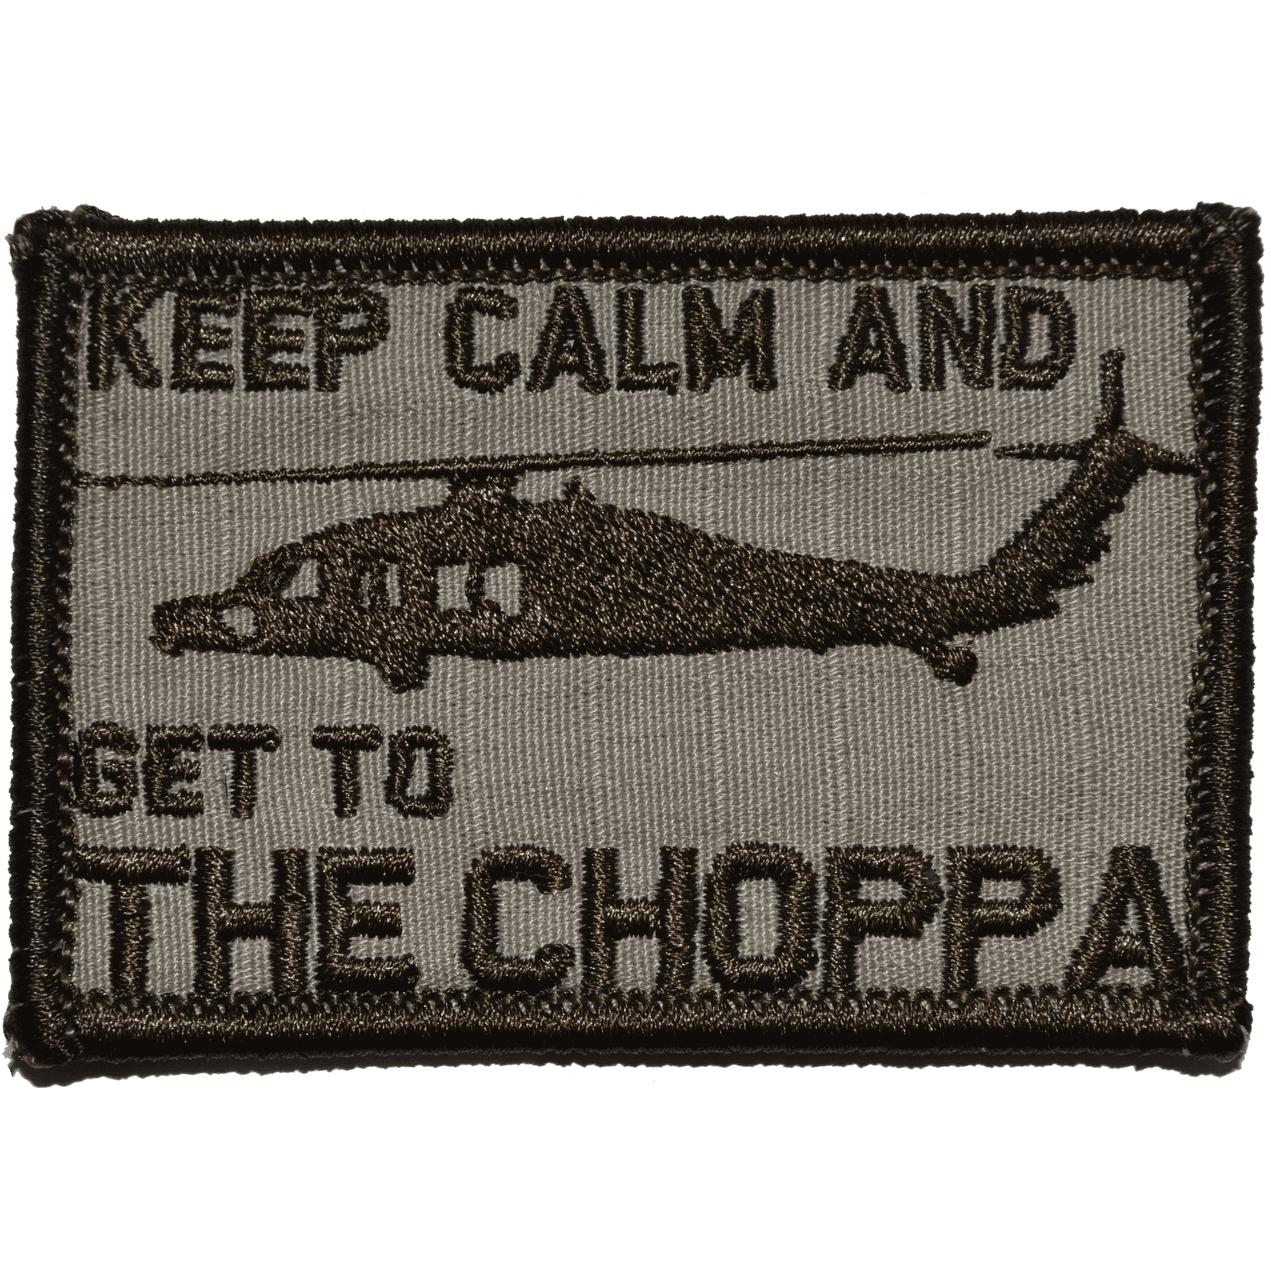 Keep Calm and Get To The Choppa! Predator Parody - 2x3 Patch